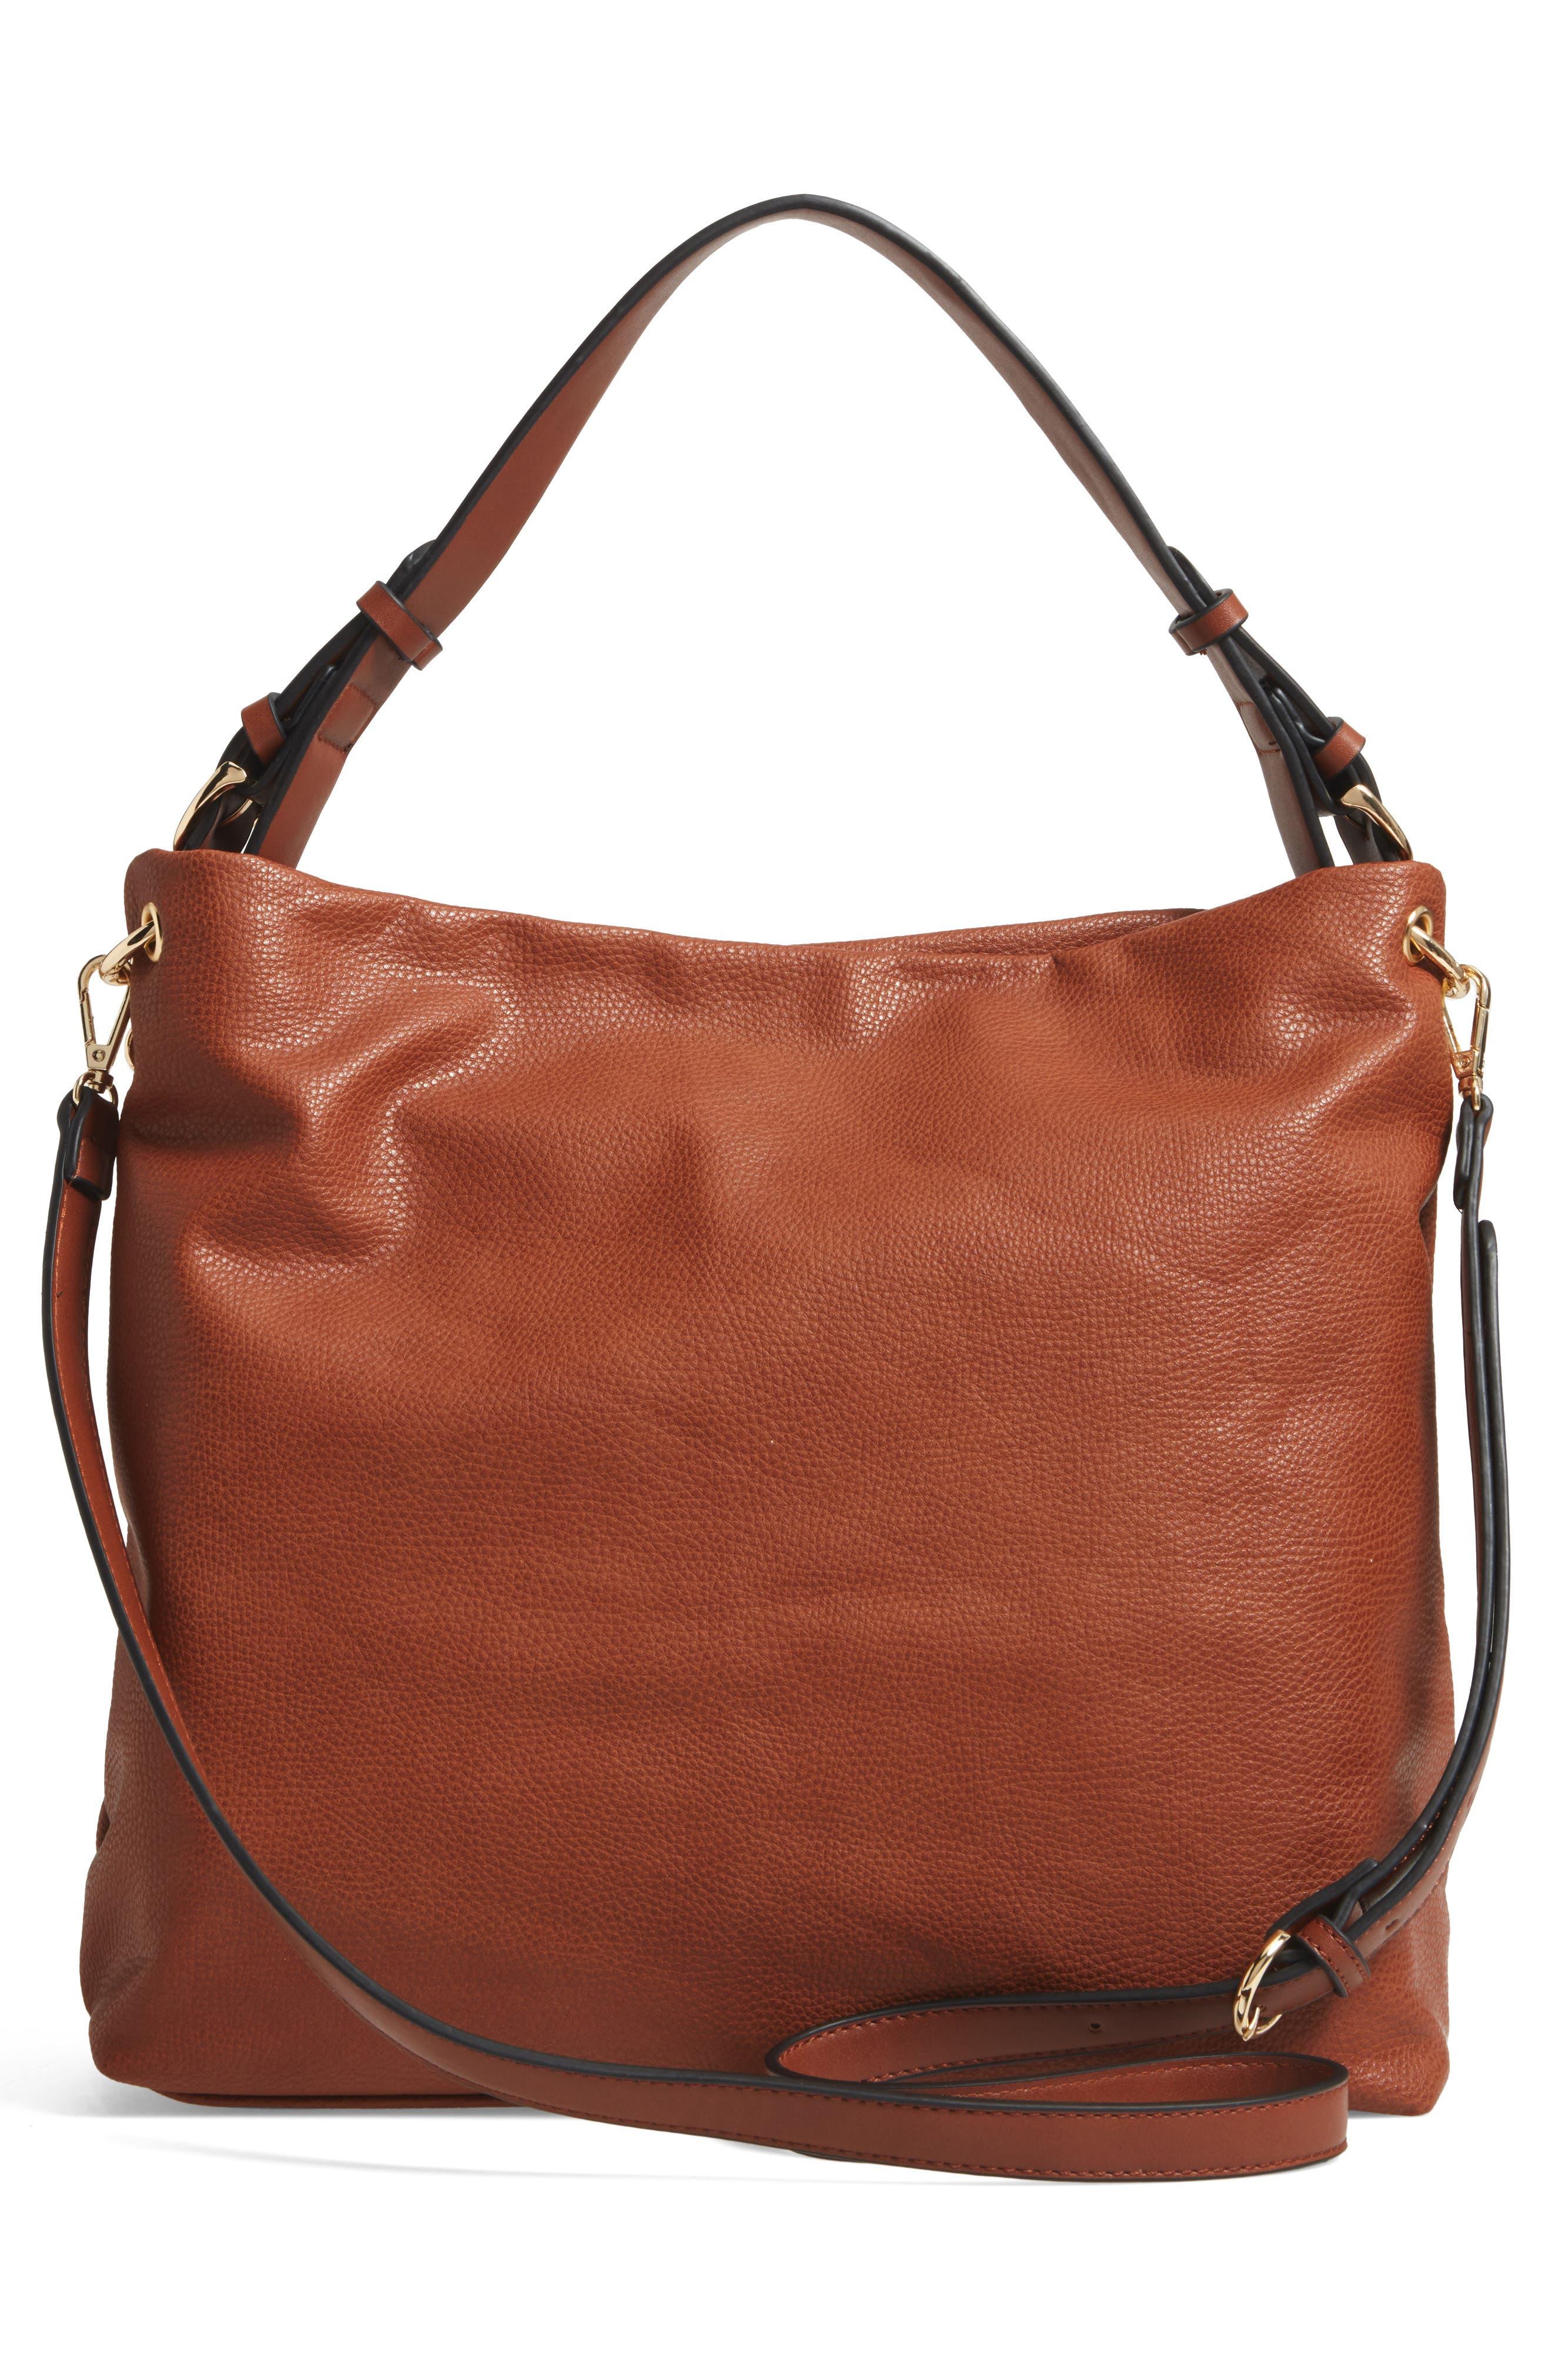 Taylor Faux Leather Shoulder Bag,                             Alternate thumbnail 9, color,